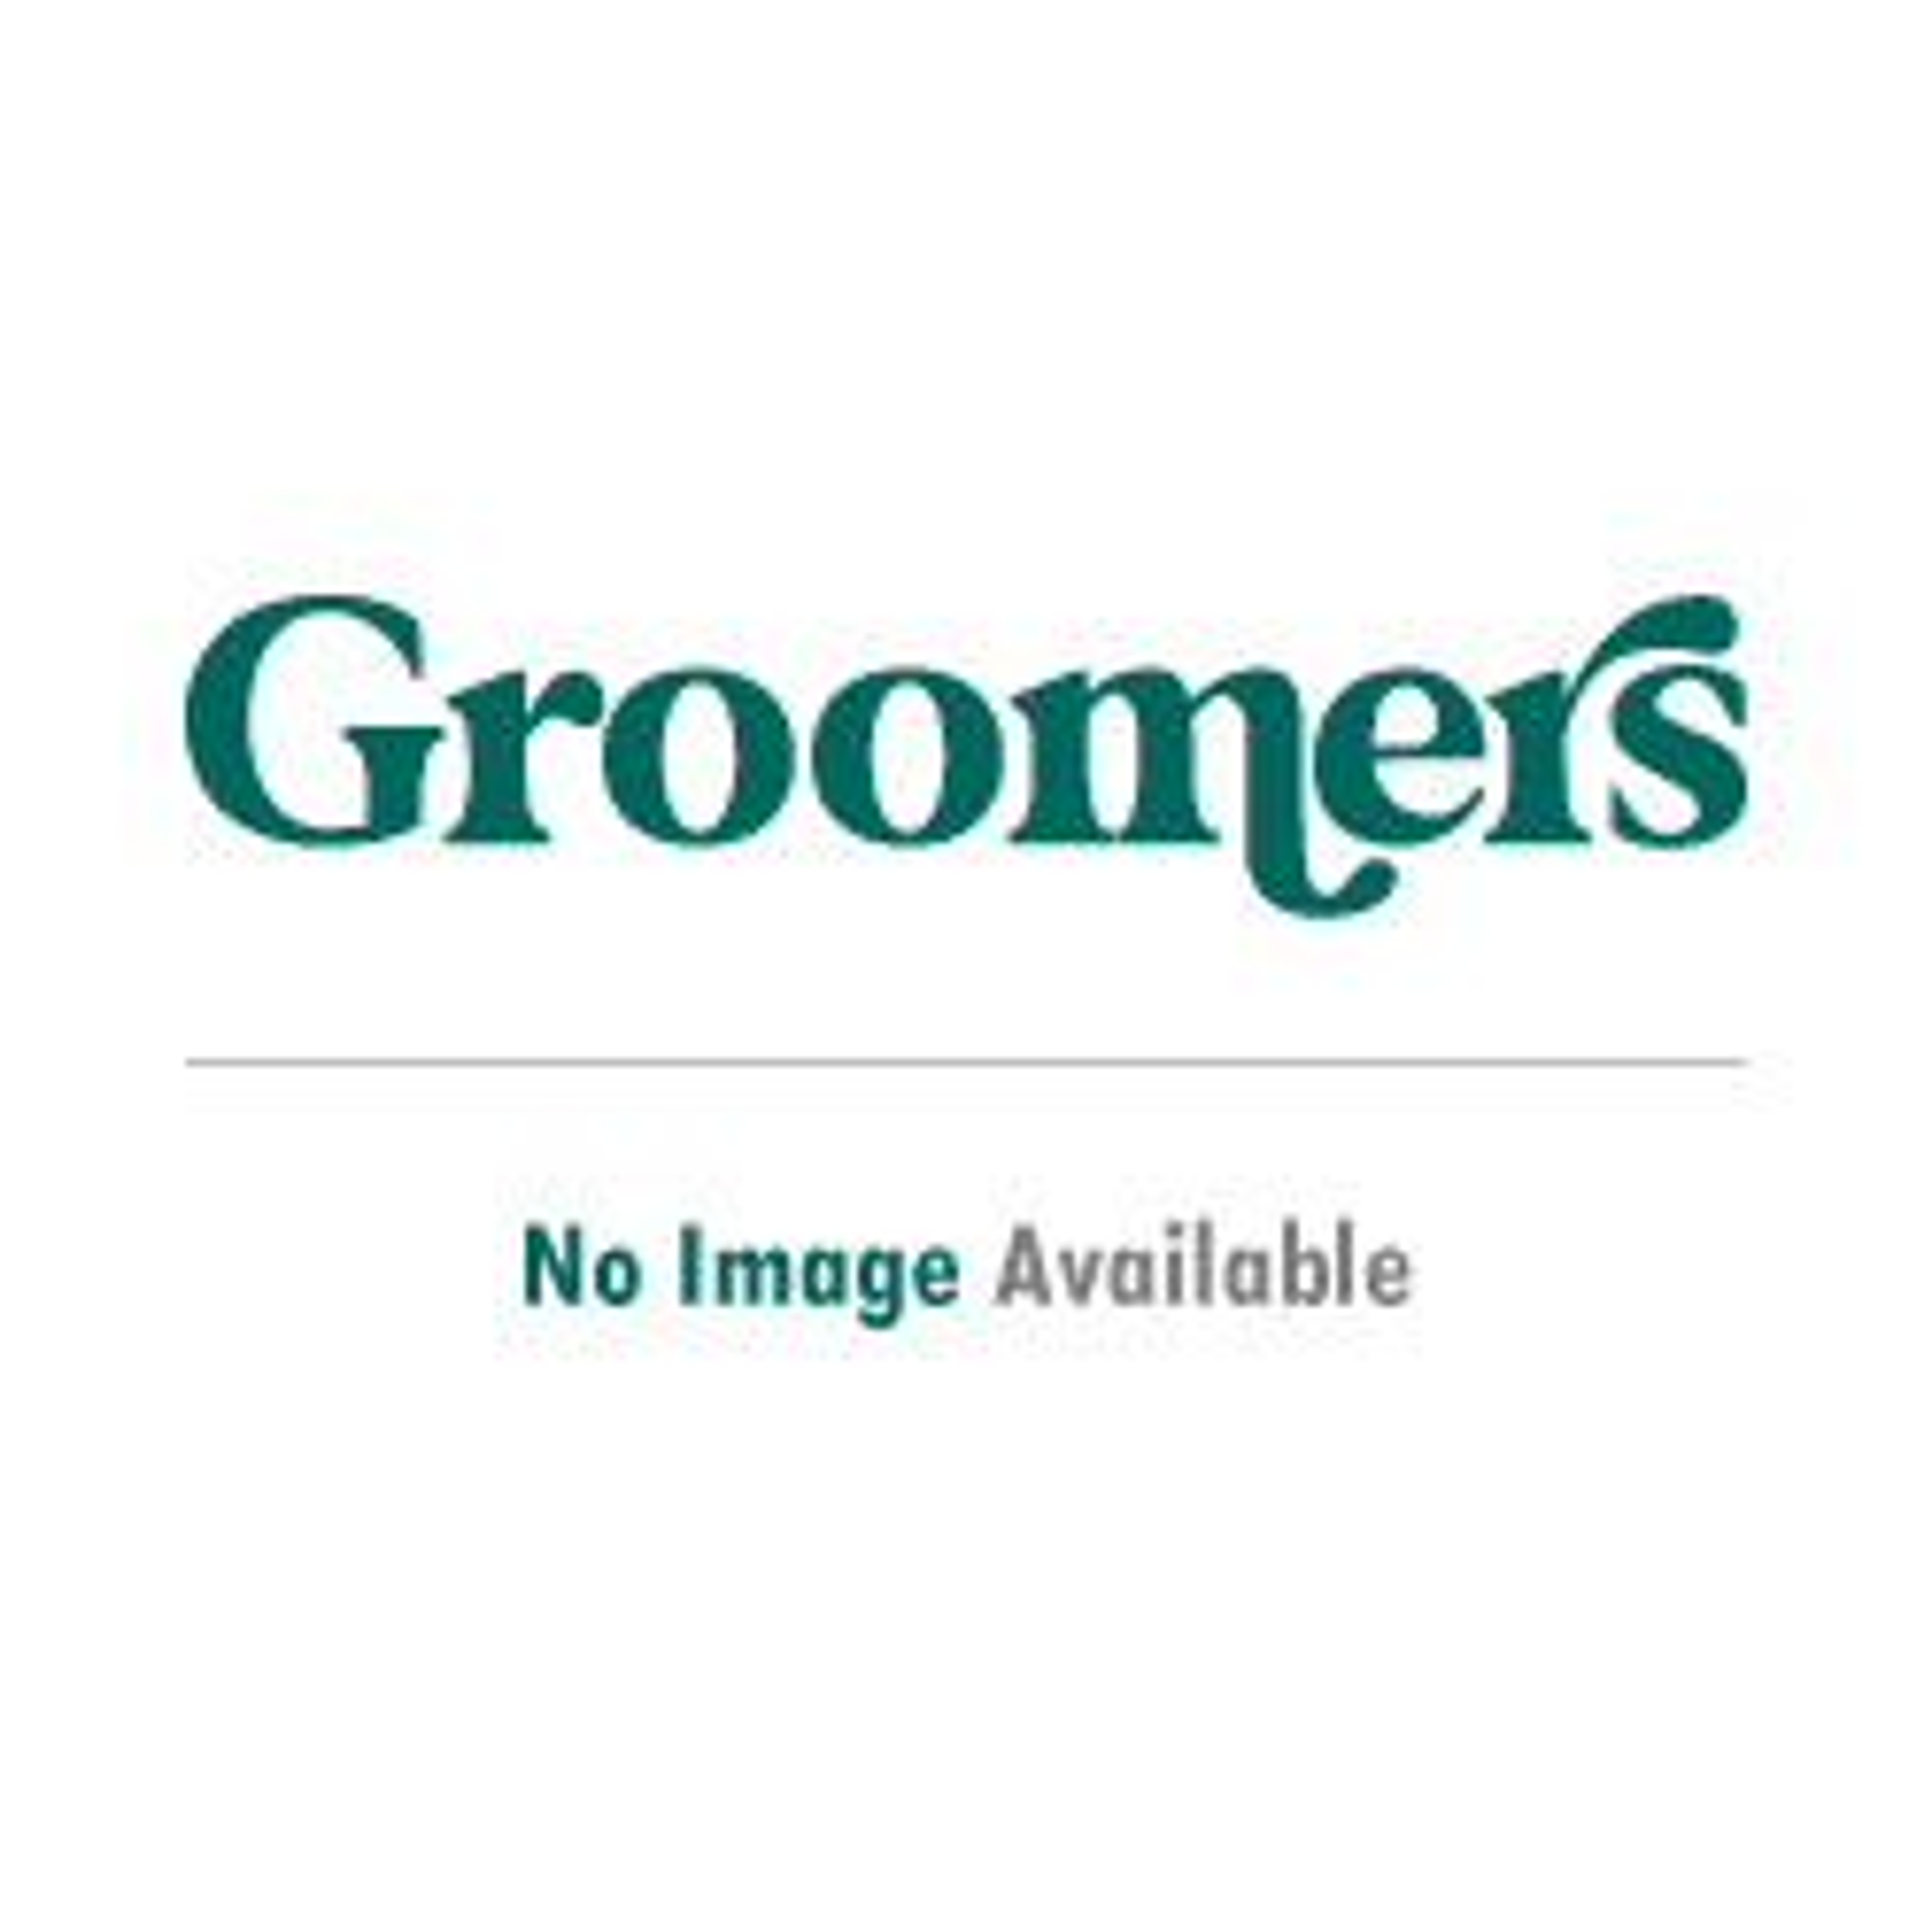 Grooming Hard Rubber Rake Comb - NEW